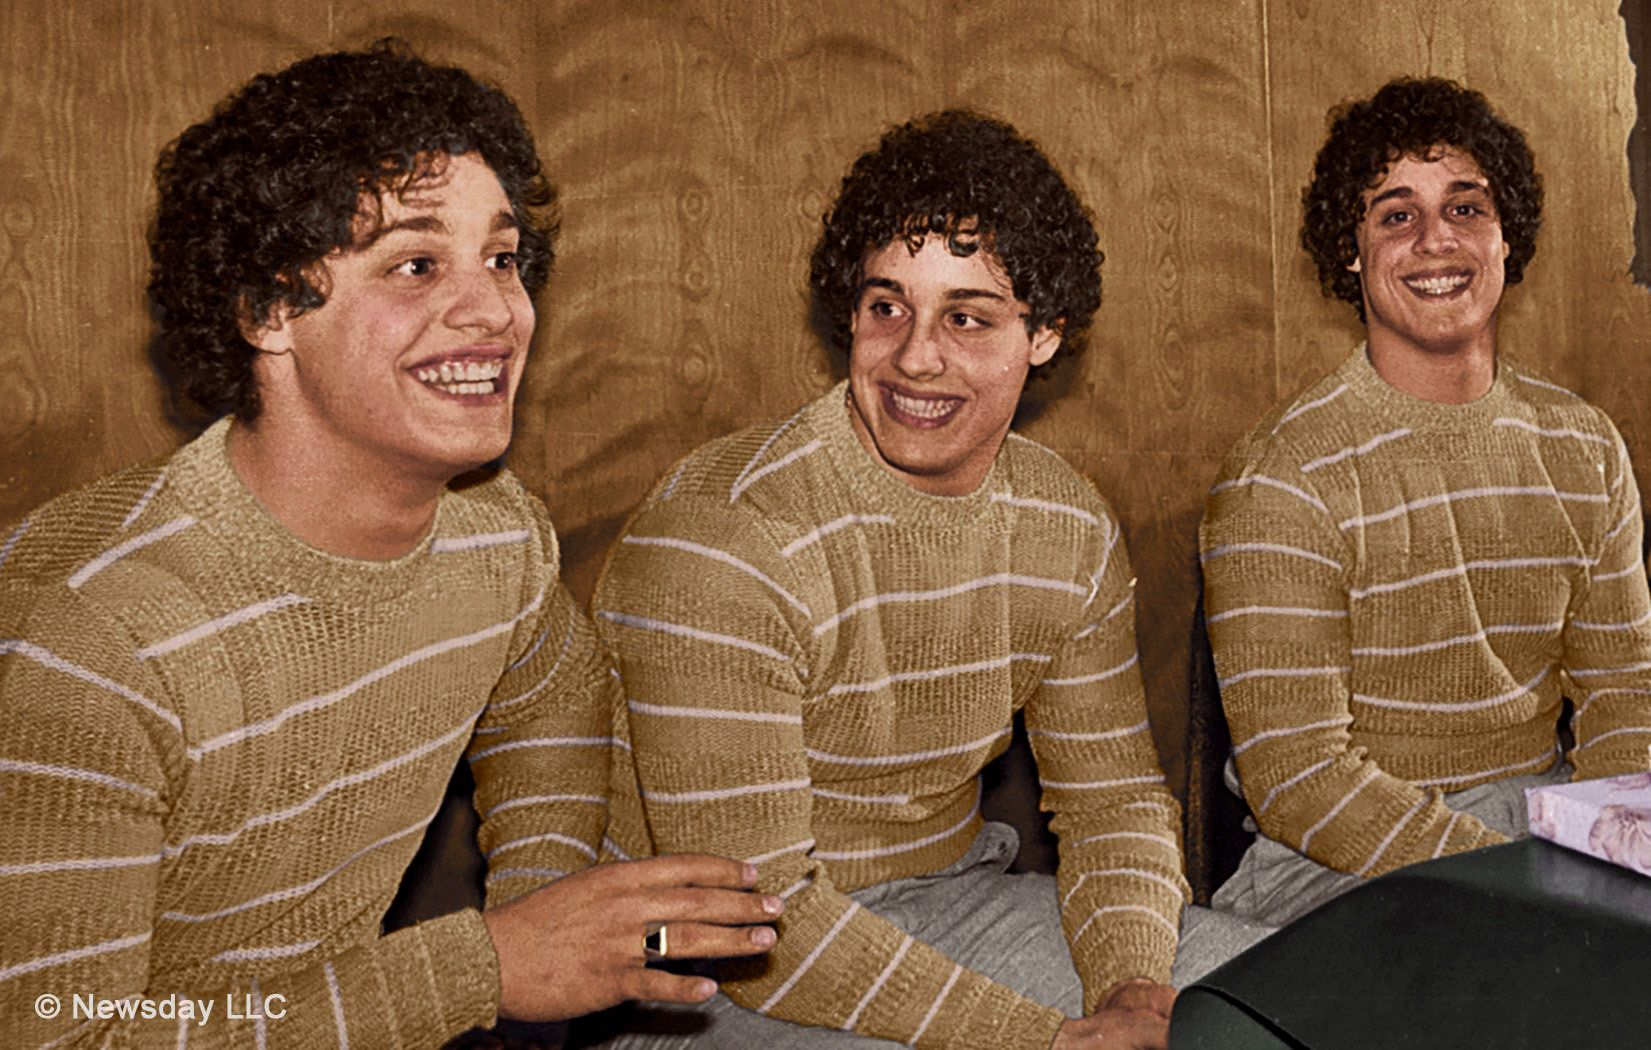 Eddy Galland,David Kellman andRobert Shafran, the three identical strangers.